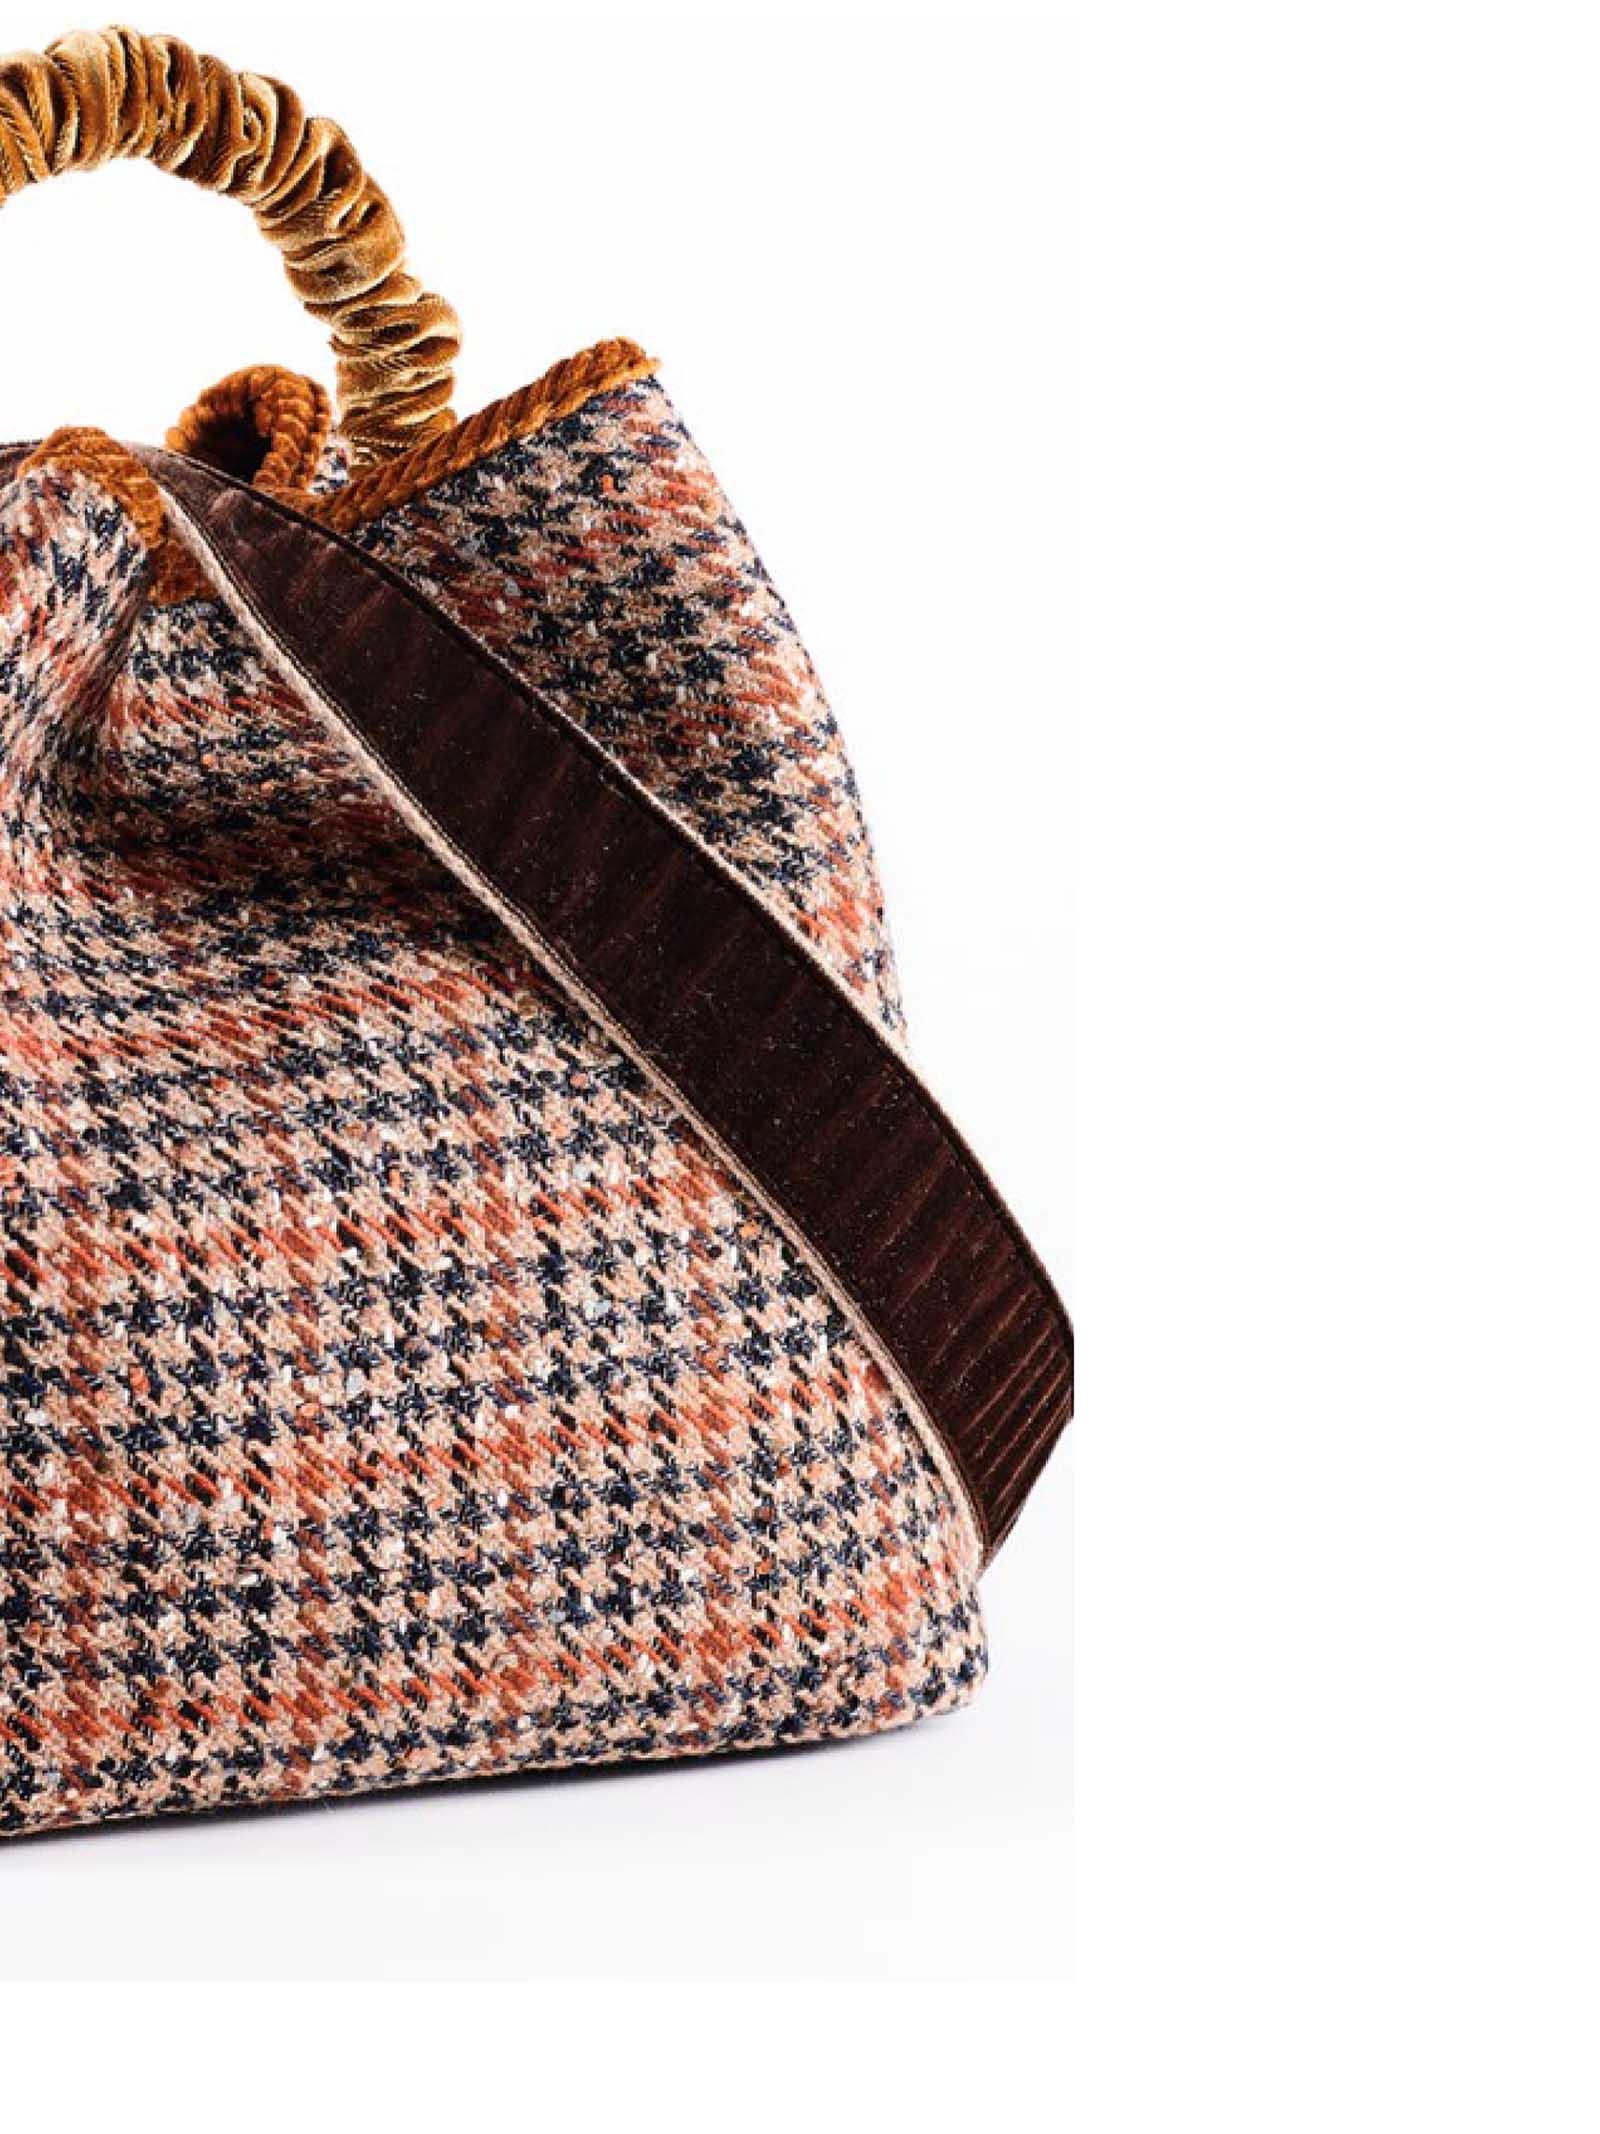 Women's Bucket Bag Zermat Check in Wool Jacquard Check Velvet Handle and Fancy Shoulder Strap Via Mail Bag | Bags and backpacks | ZERMATC01